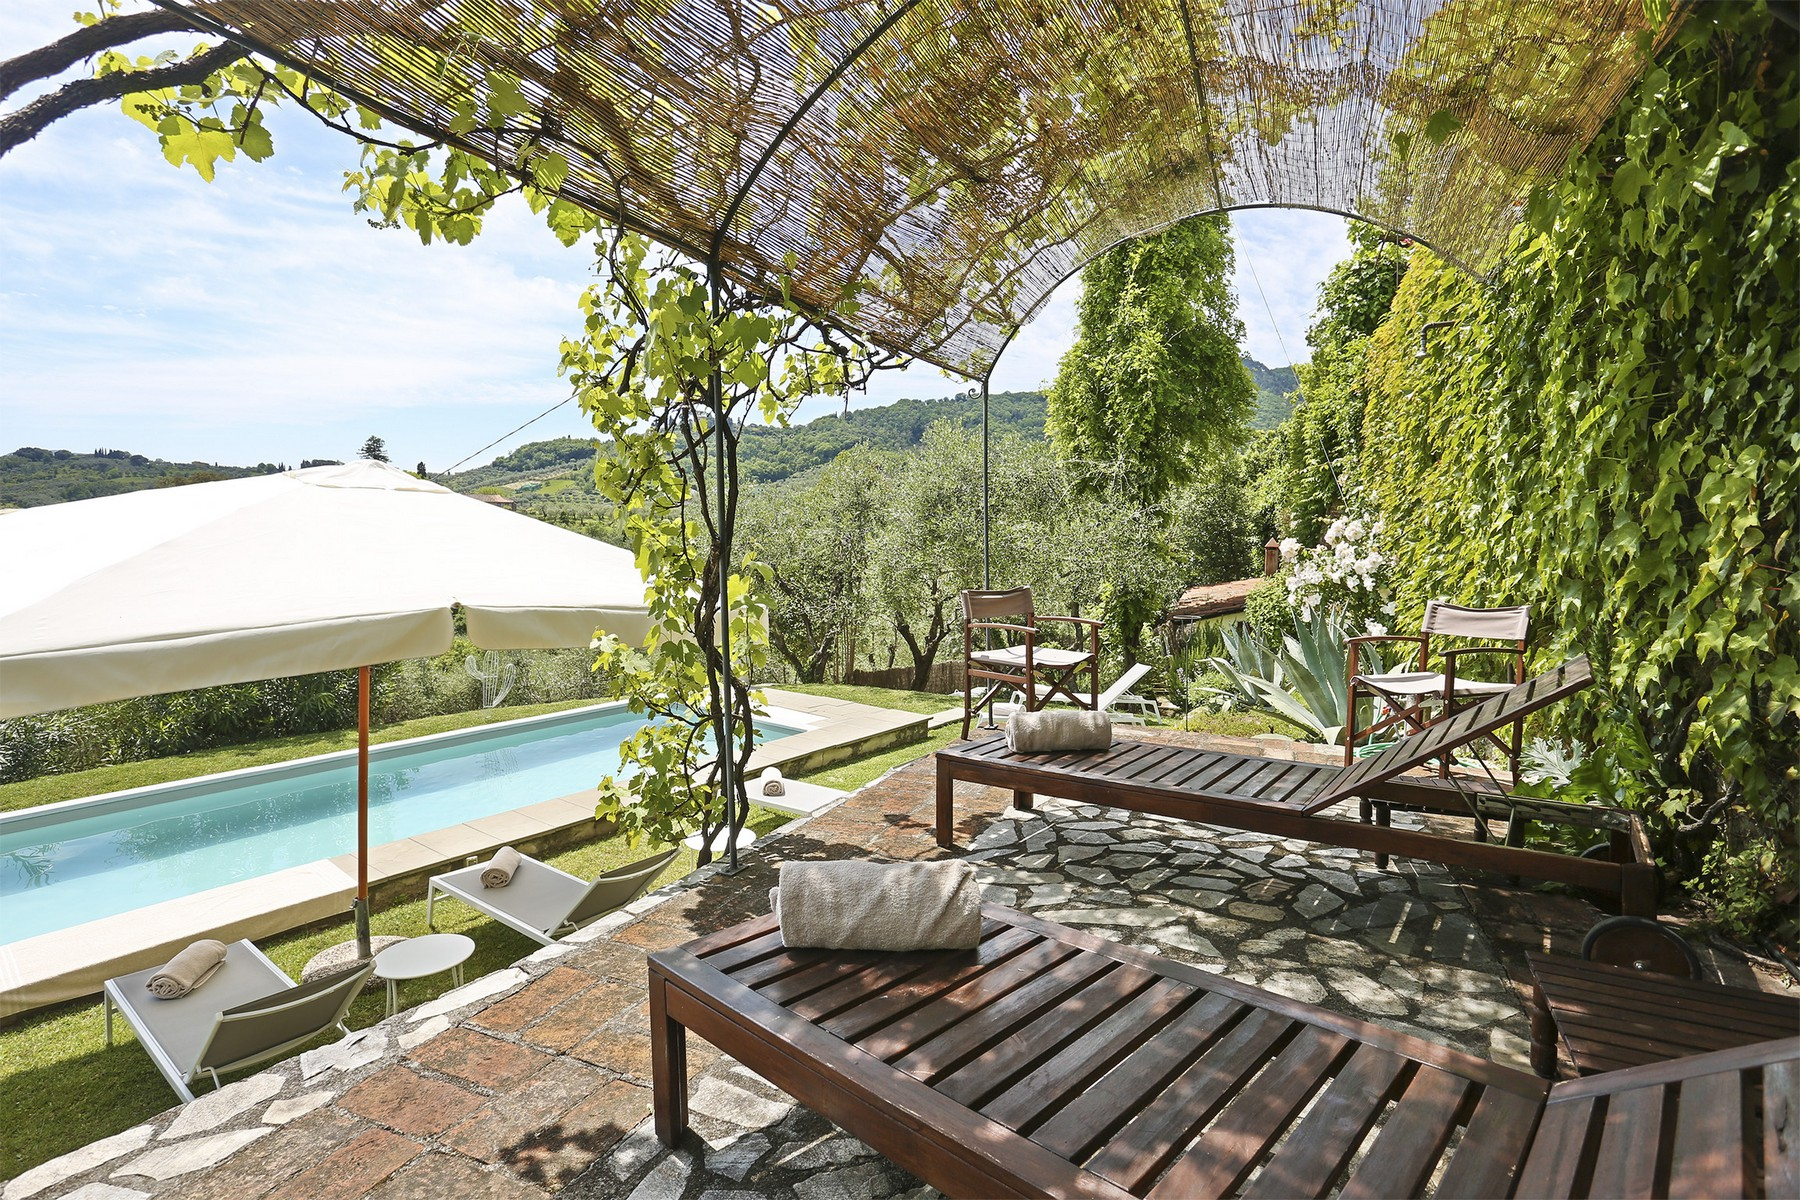 Villa in Vendita a Lucca: 5 locali, 735 mq - Foto 1